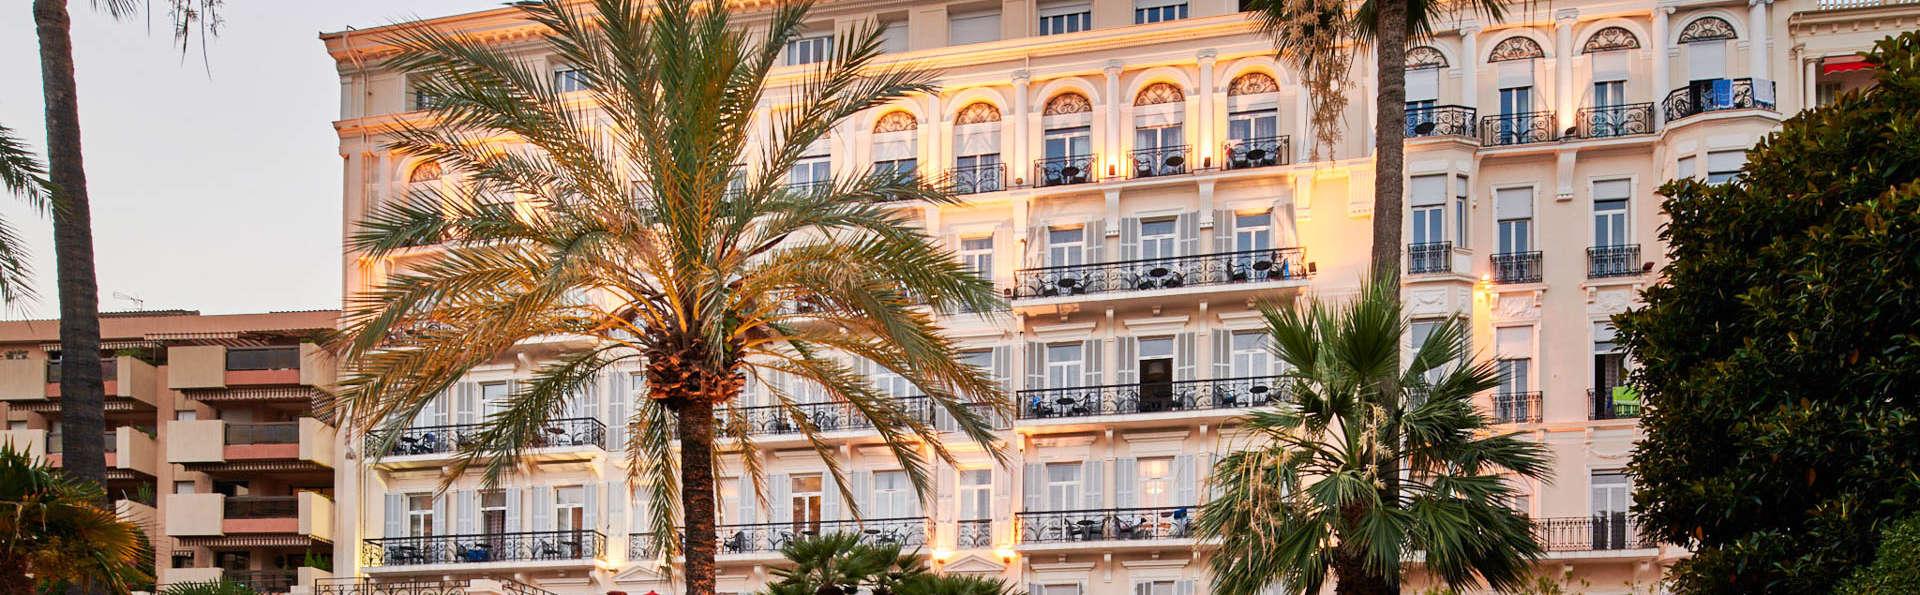 Hôtel Vacances Bleues Royal Westminster - EDIT_N2_EXTERIOR-7.jpg